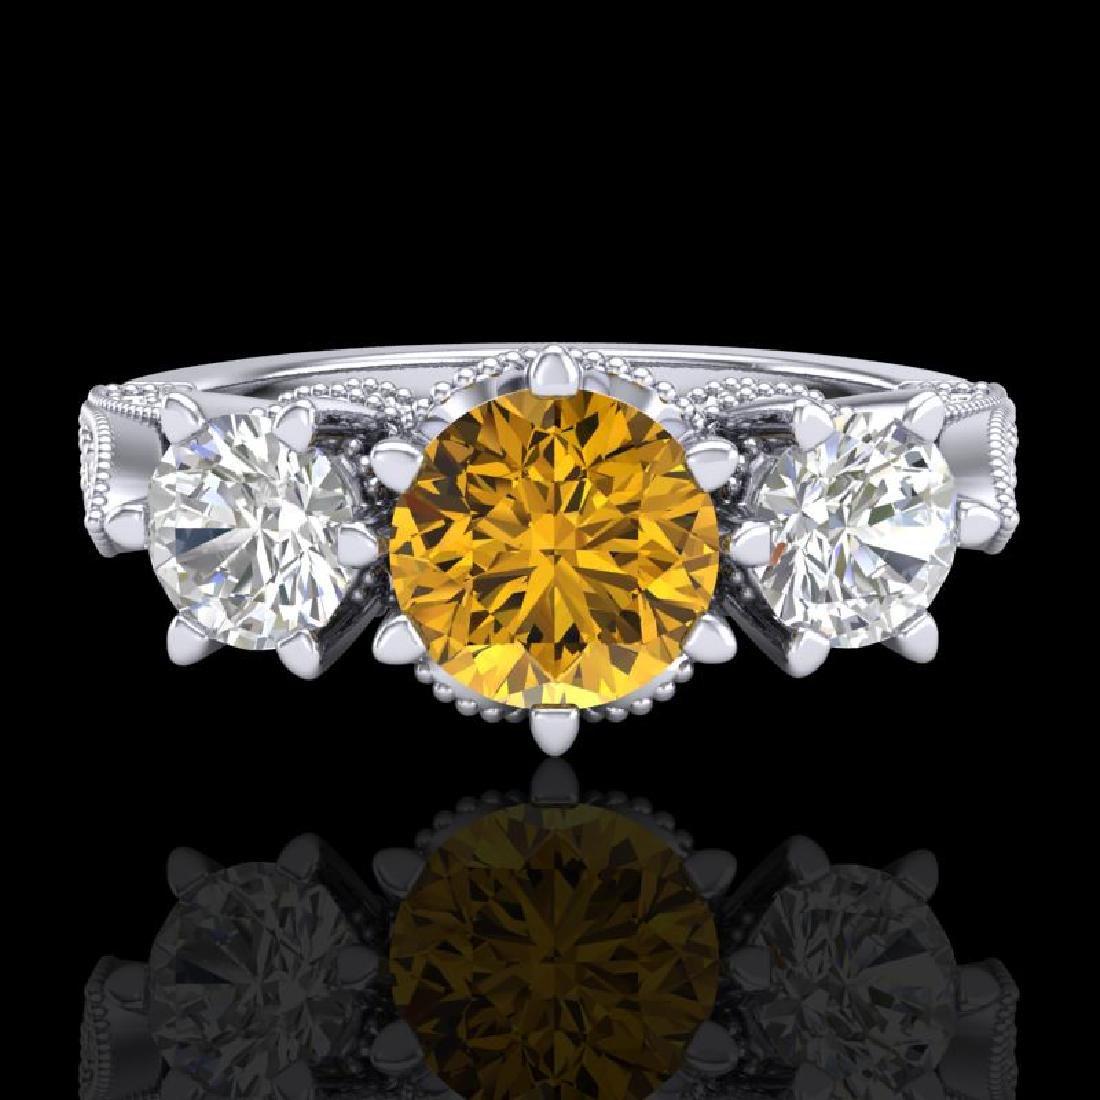 2.18 CTW Intense Fancy Yellow Diamond Art Deco 3 Stone - 2